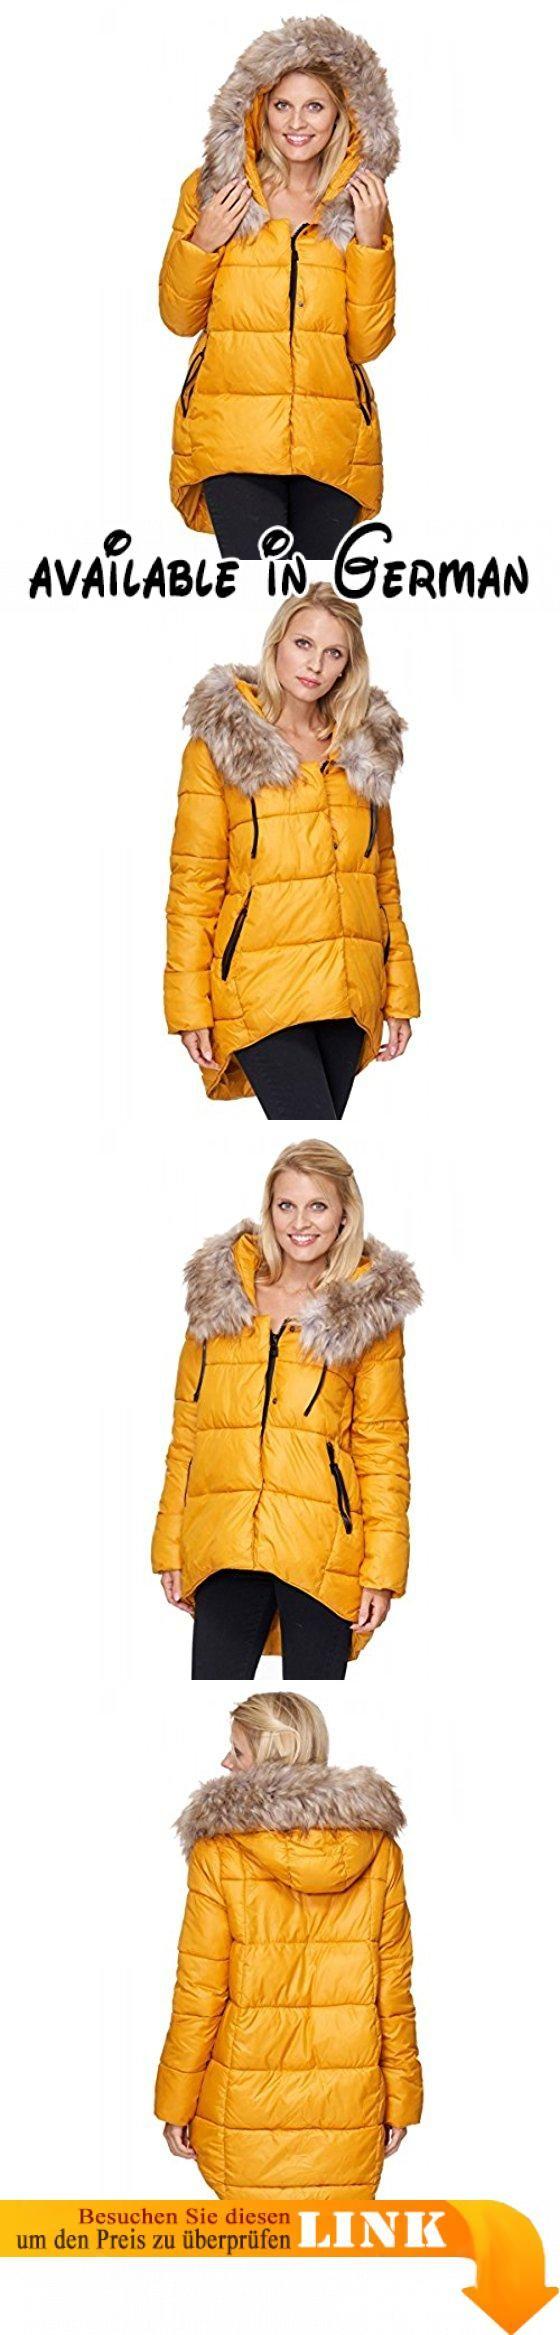 Italy Moda Damen Steppjacke mit Kapuze Winterjacke Vokuhila Style (L,  Gelb). Coole